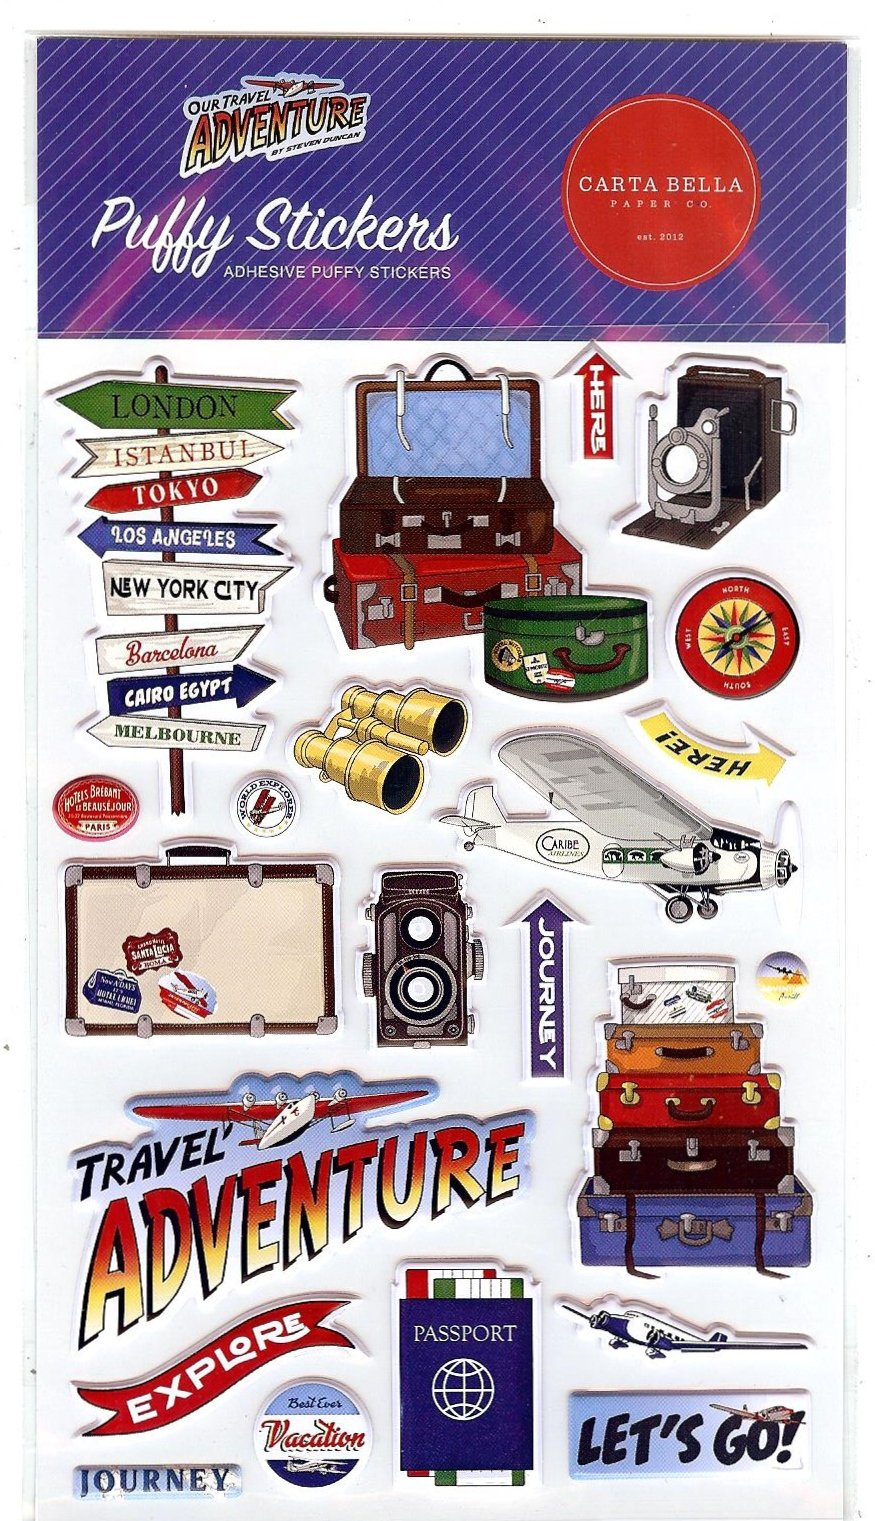 Carta Bella - Our Travel Adventure Puffy Stickers